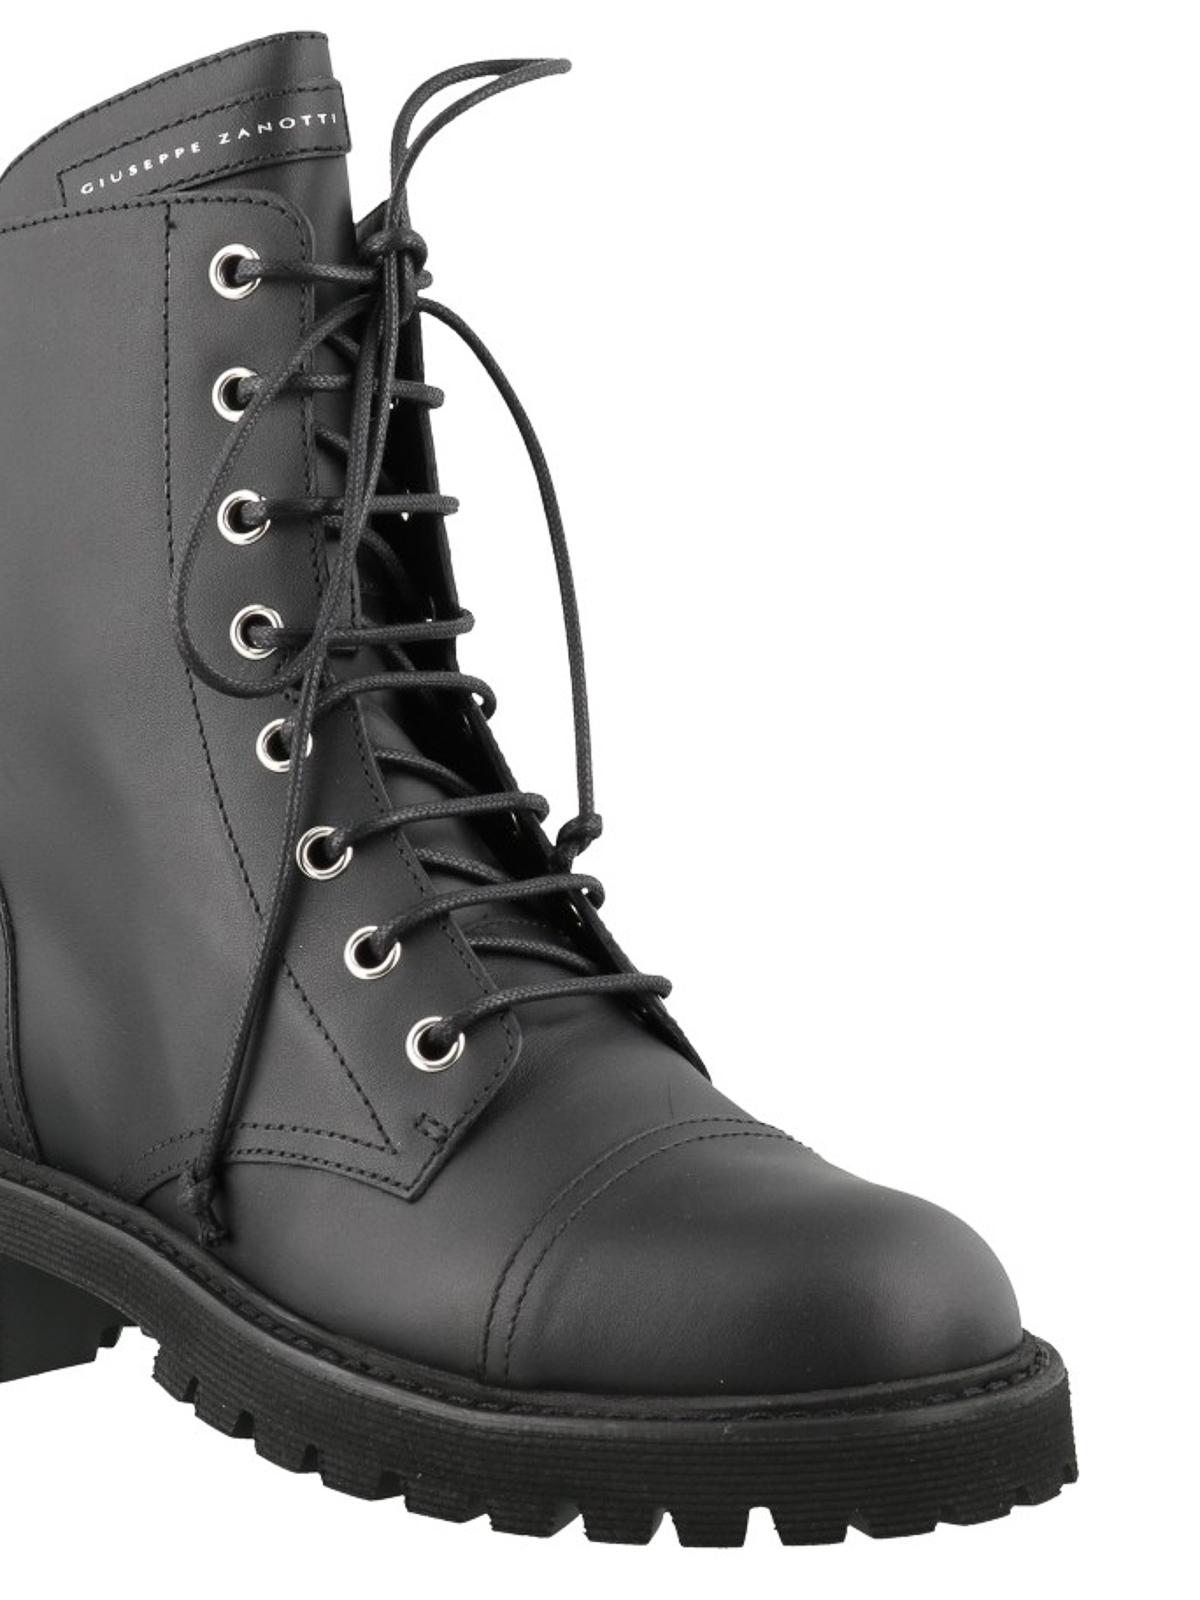 Thora black leather biker boots